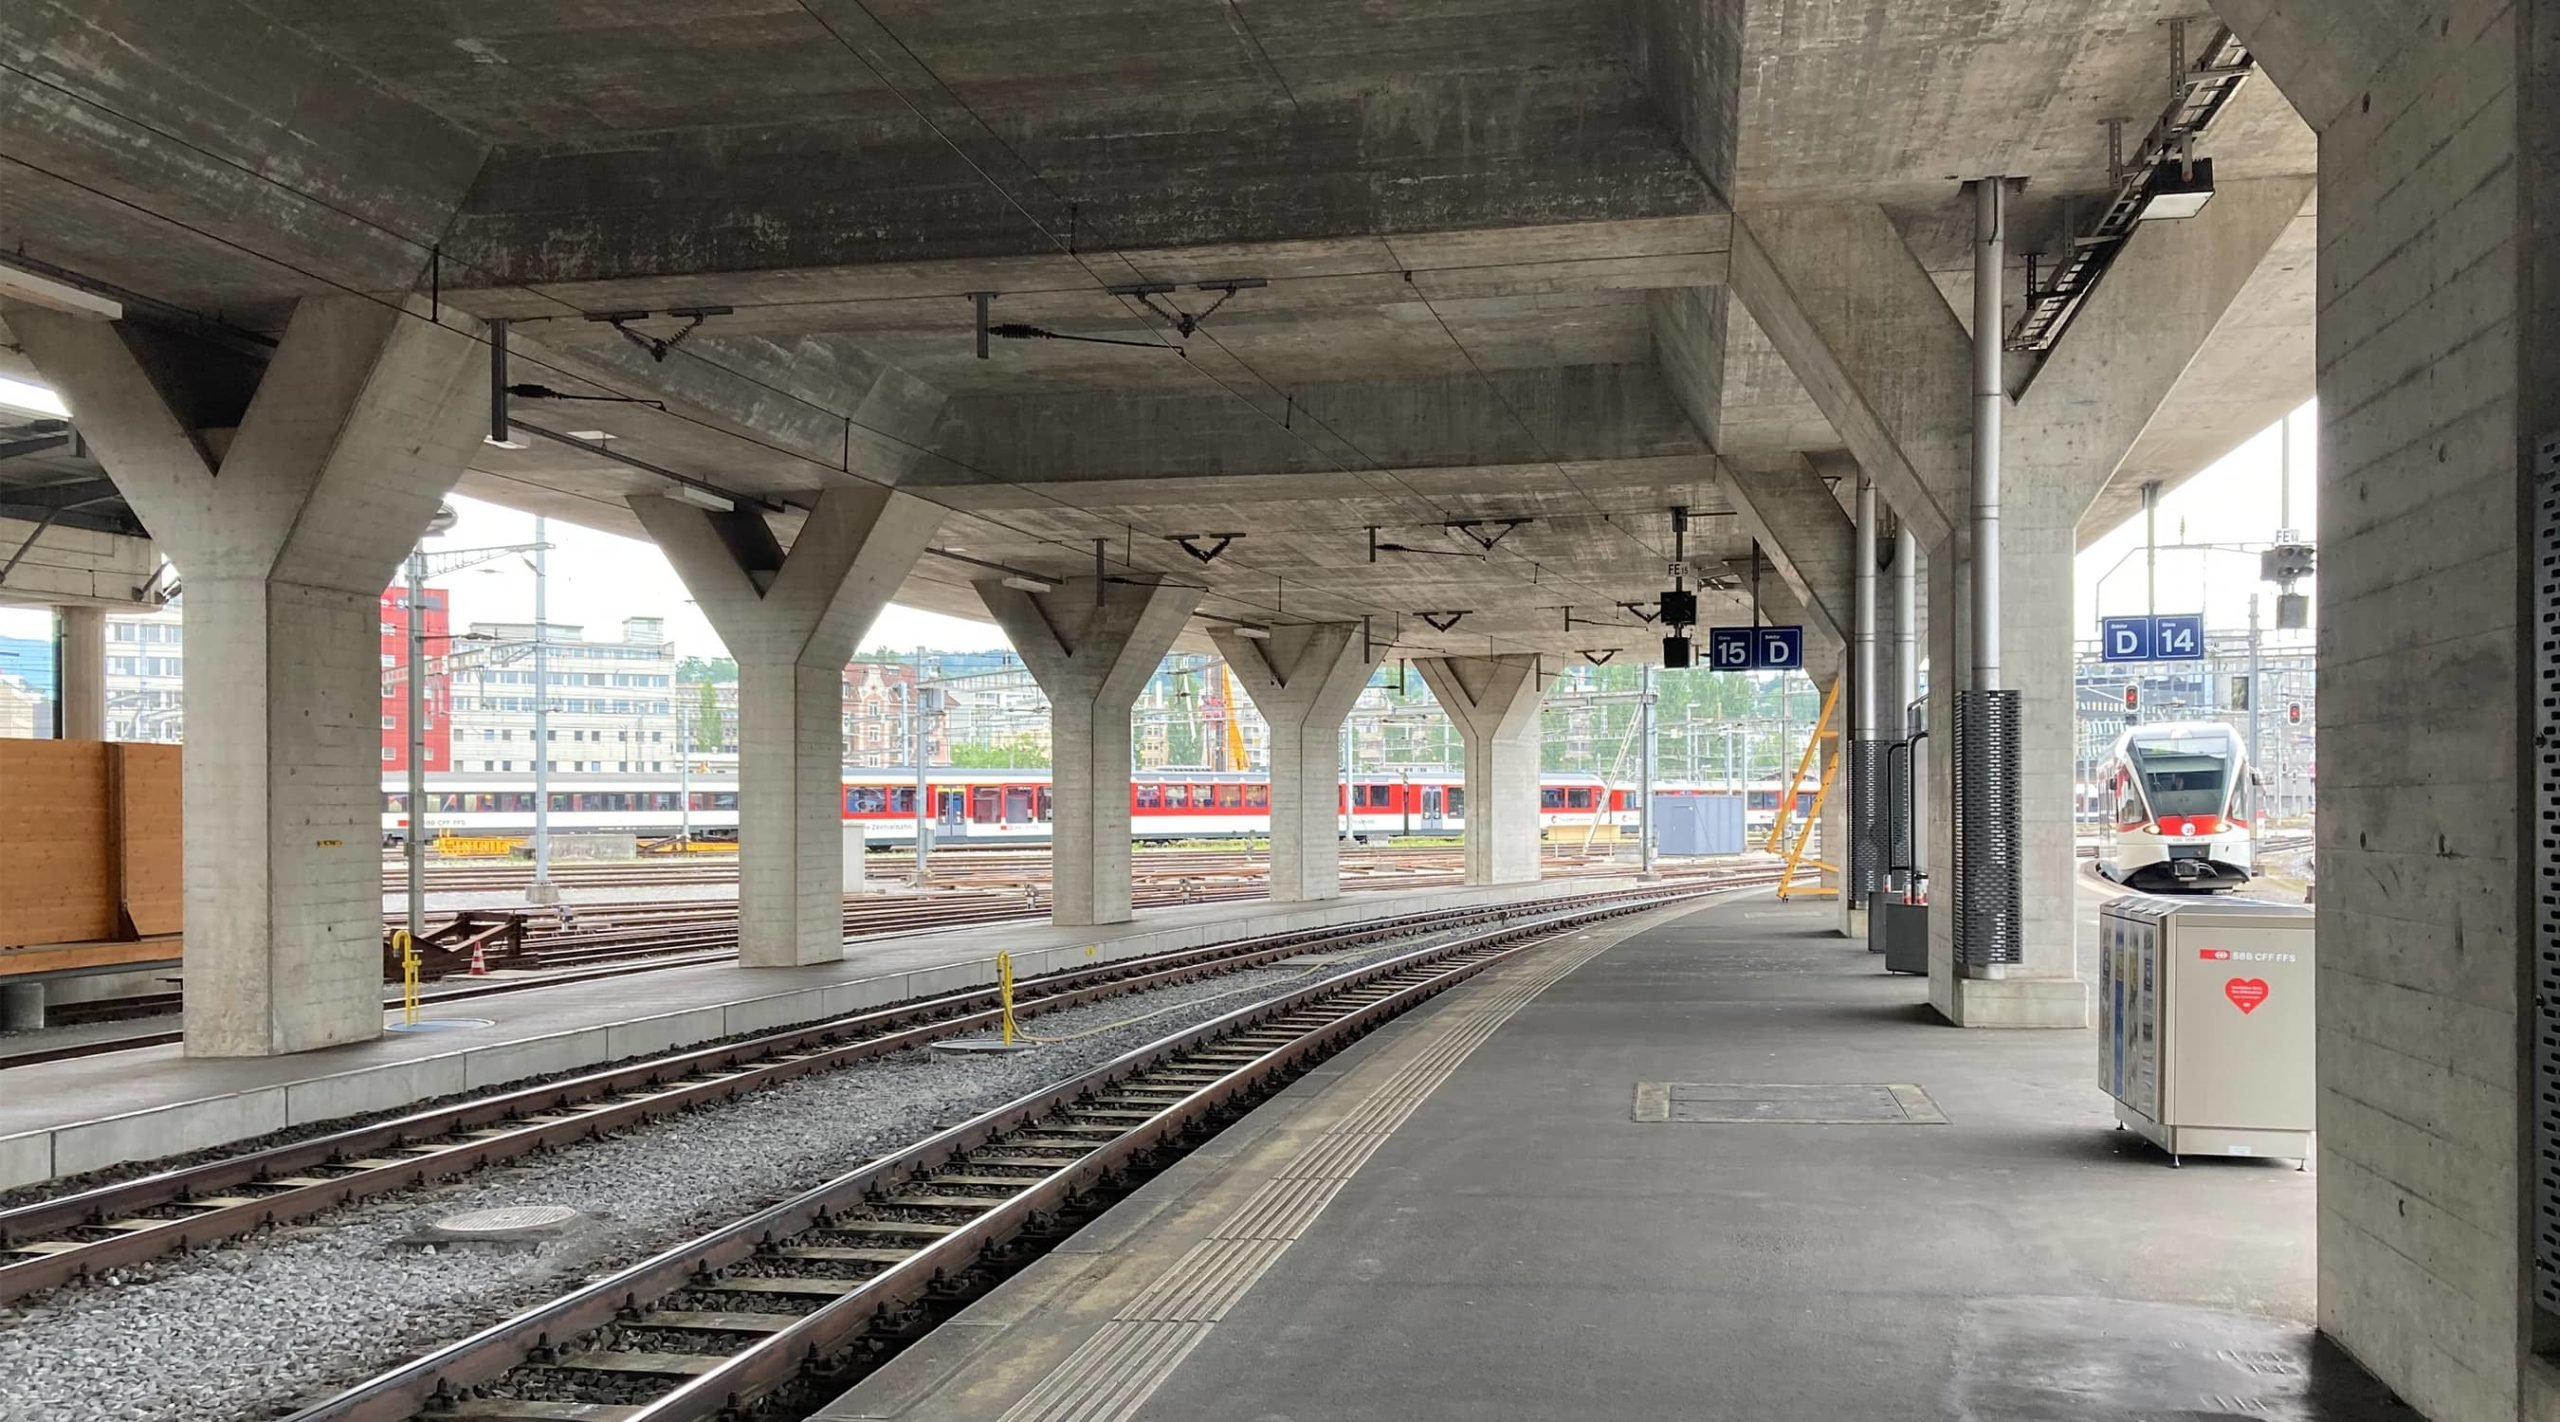 yellow z — Durchgangsbahnhof Luzern